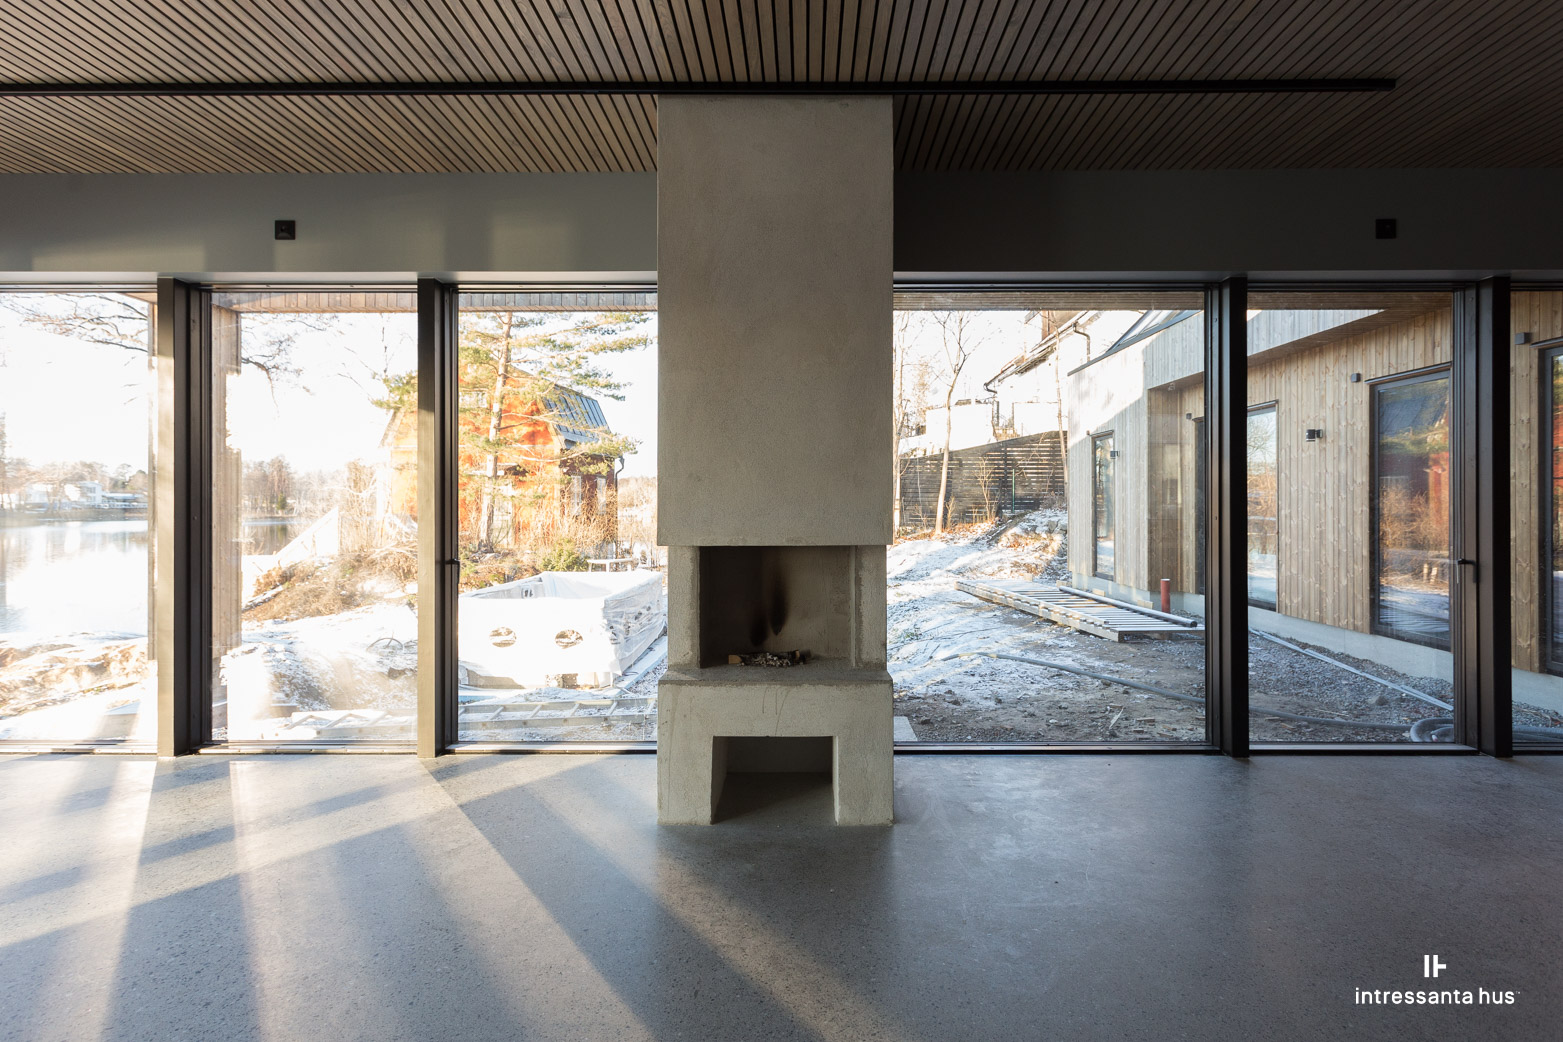 intressantahus-house1-065